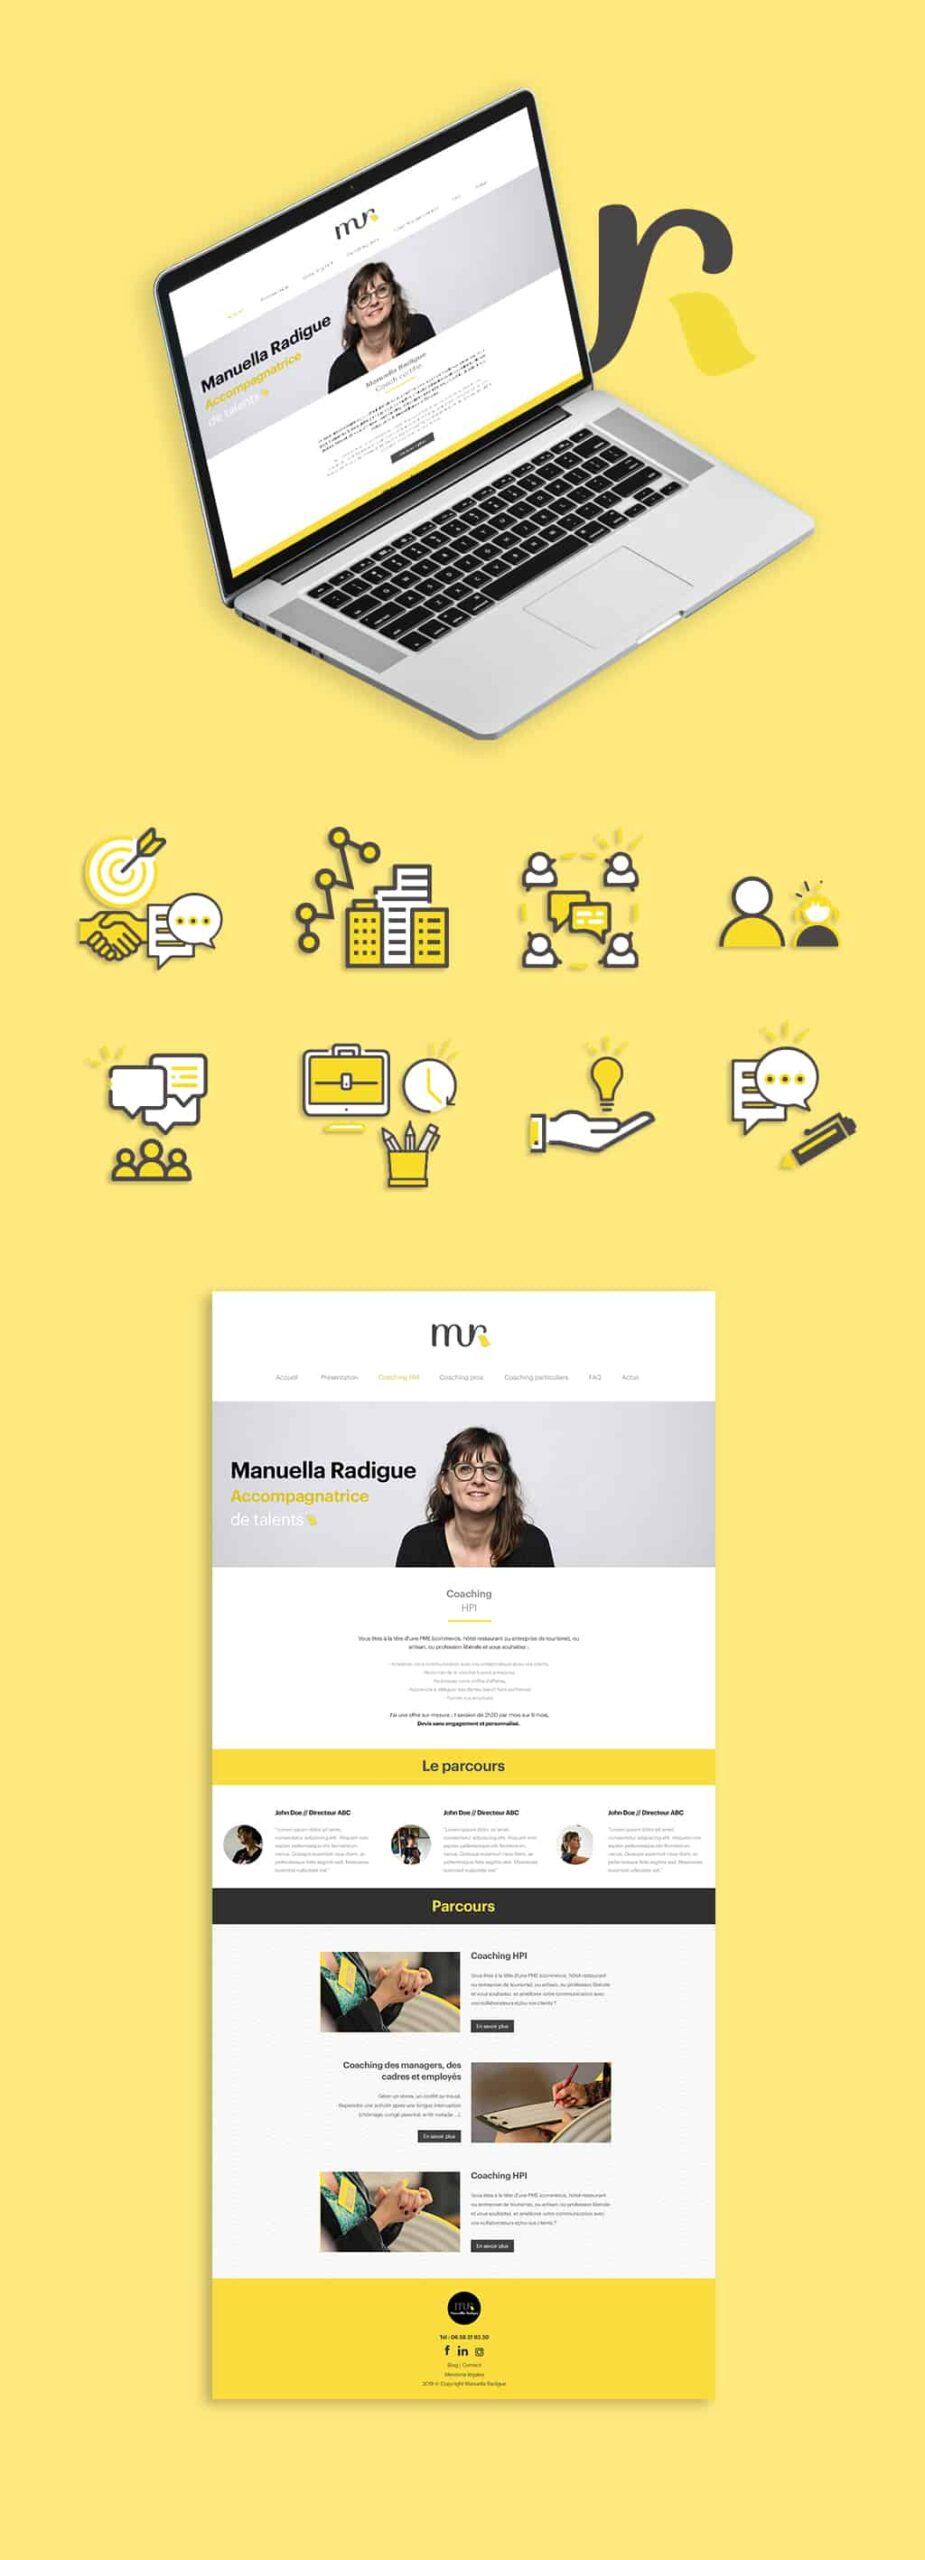 Manuella Radigue – Webdesign